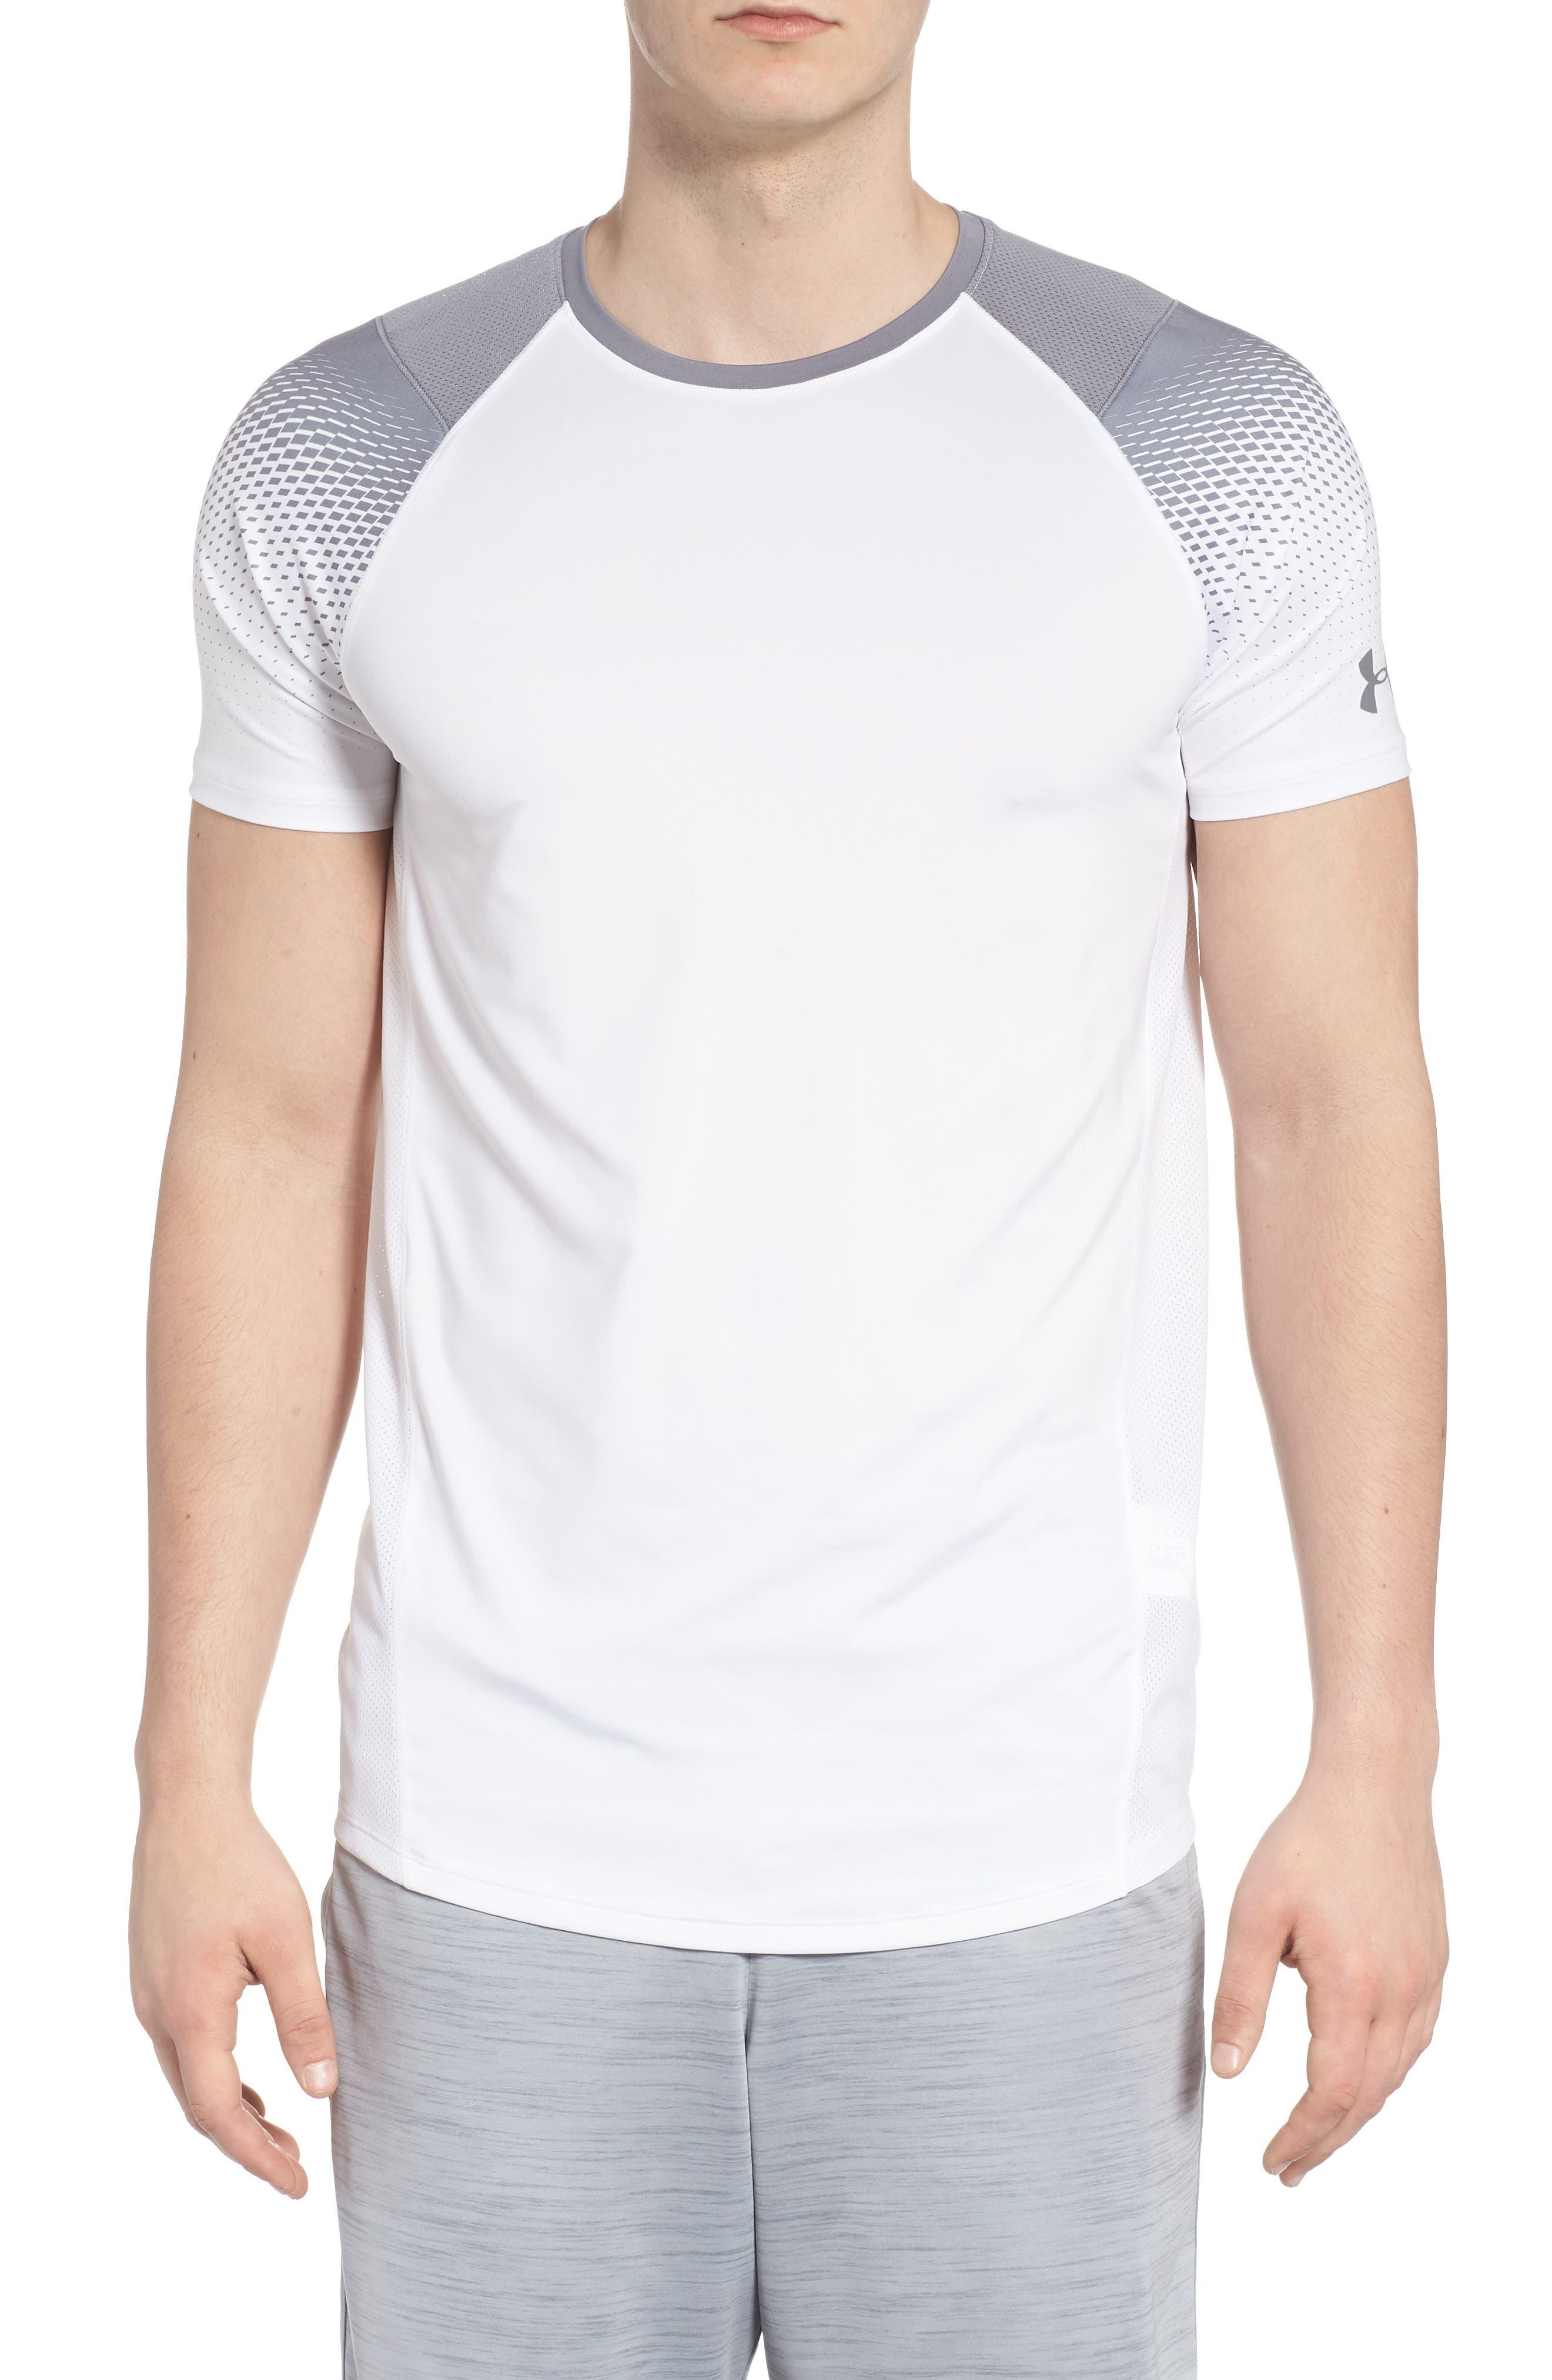 MK1 Dash Print Crewneck T-Shirt,                             Main thumbnail 1, color,                             WHITE / ZINC GREH / GRAPHITE